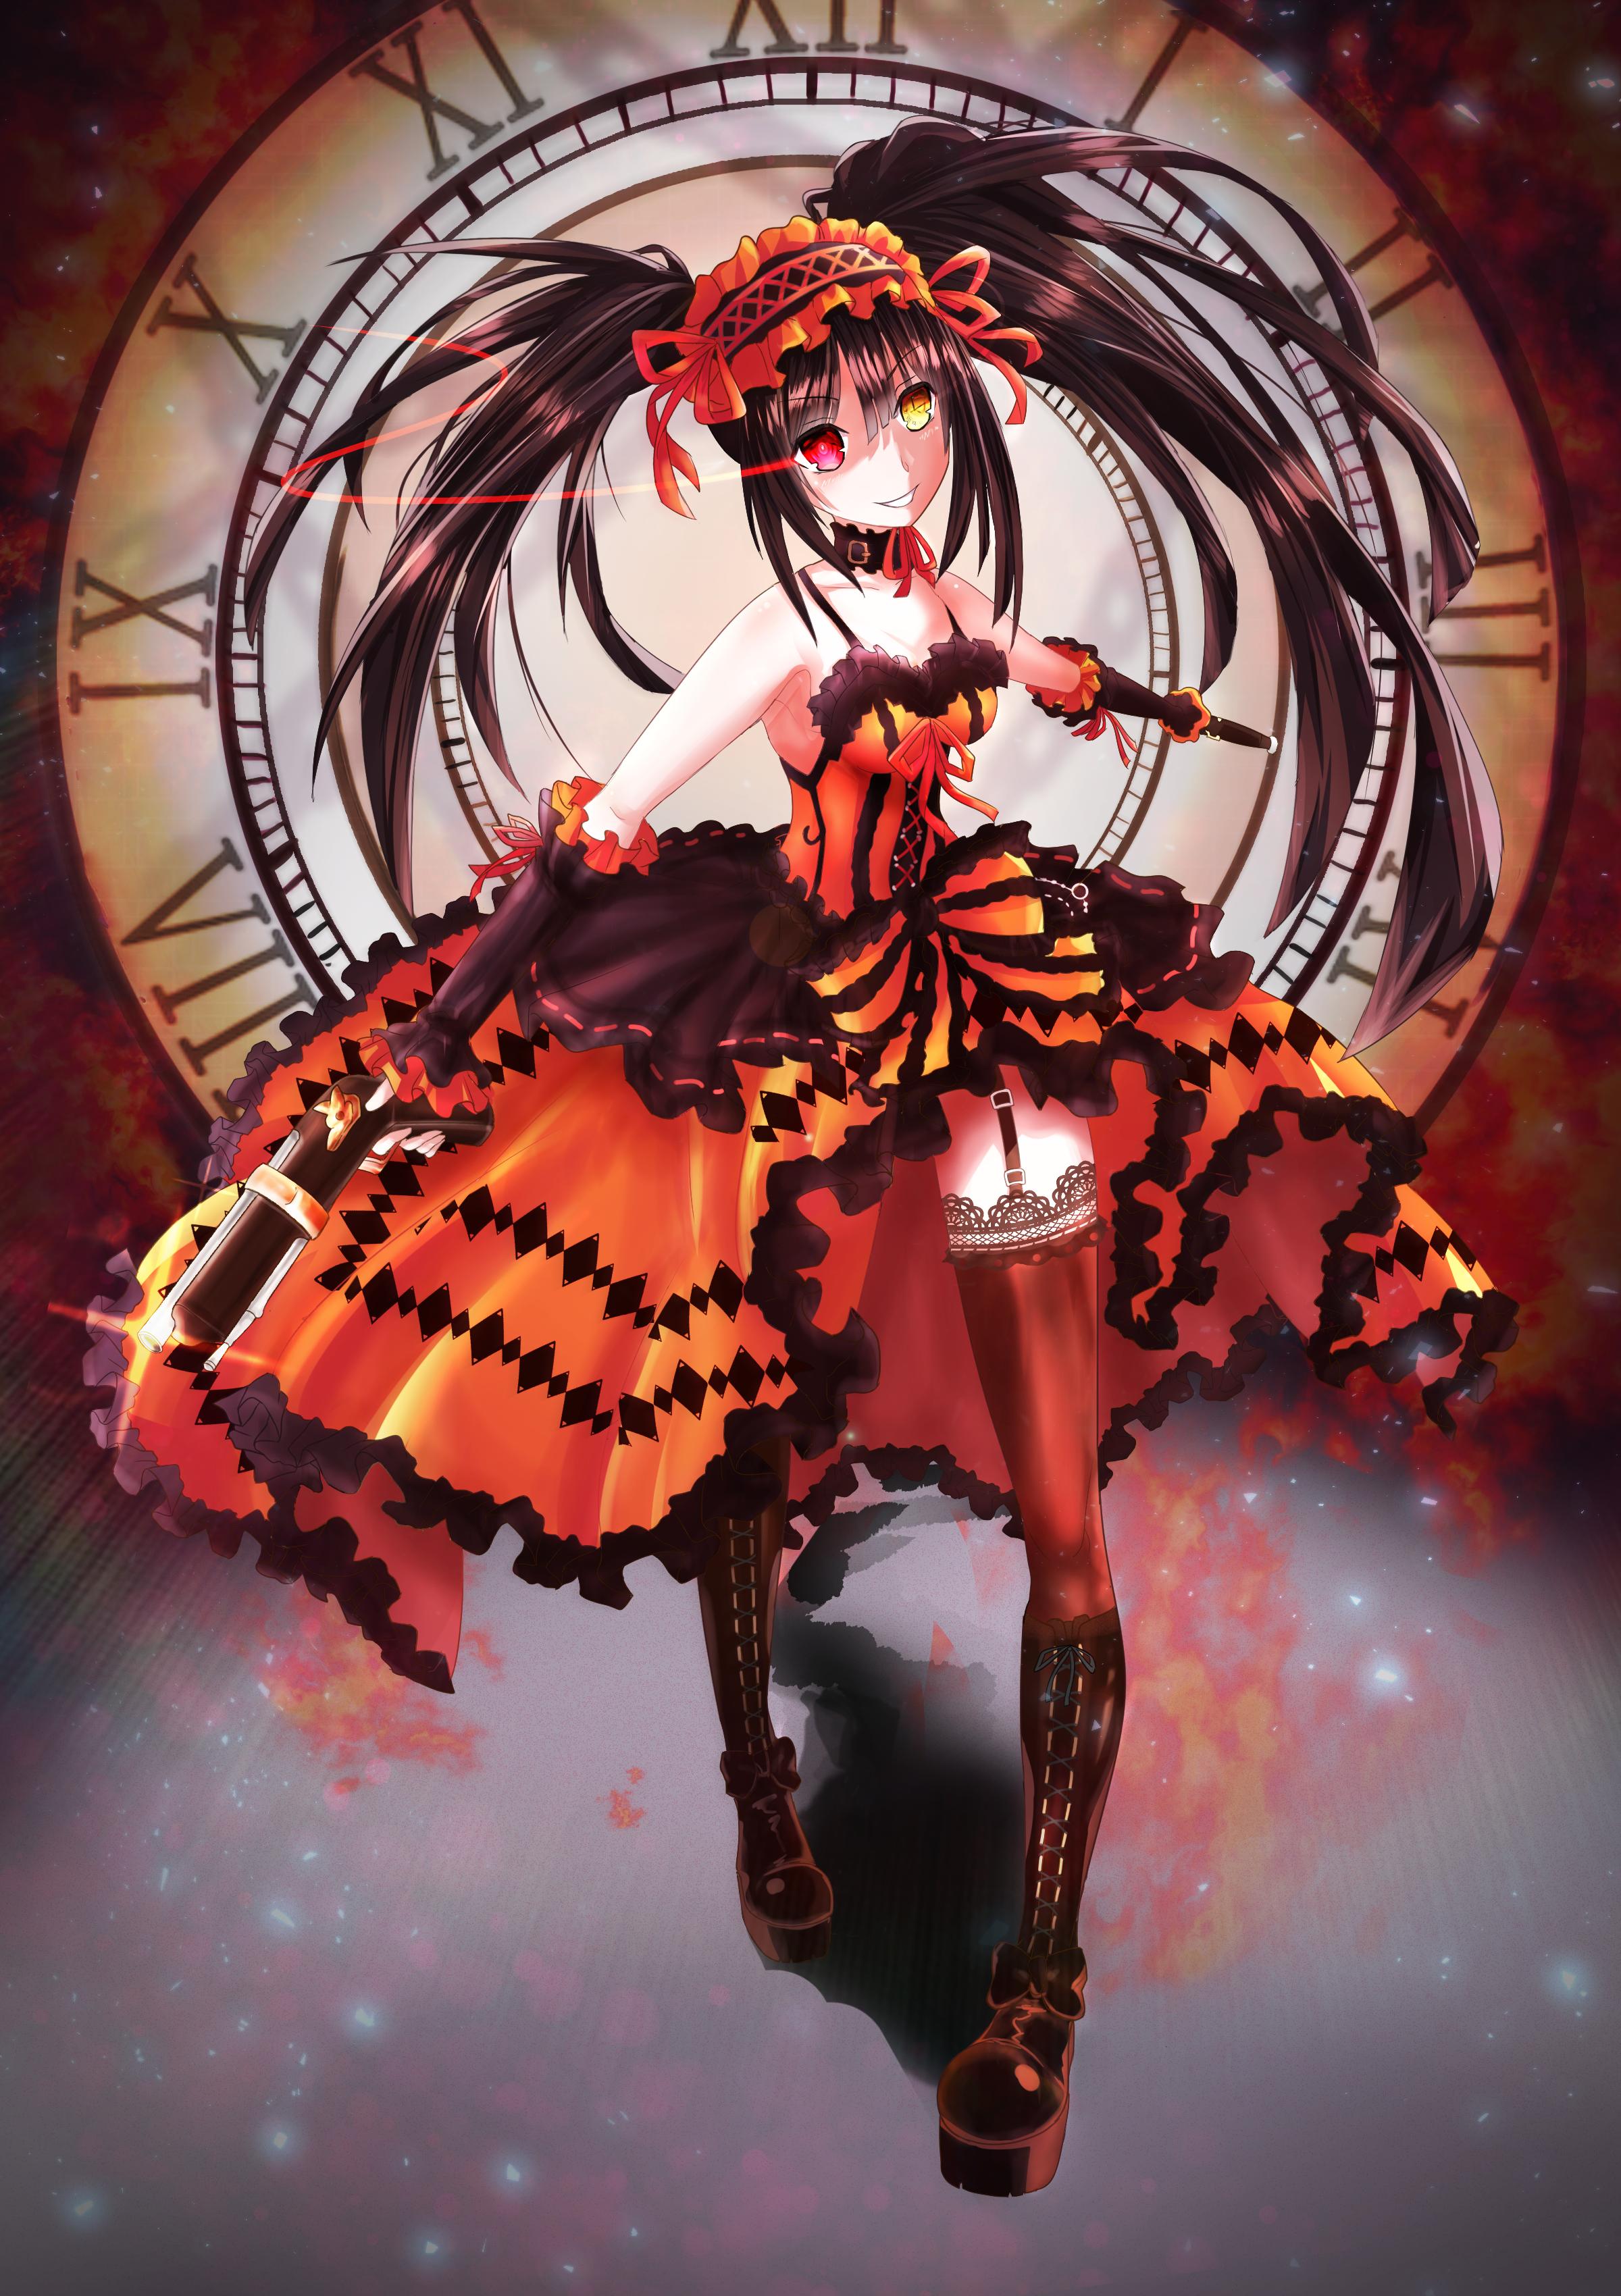 Pin by Furyaid on Kurumi Anime wallpaper, Date a live, Anime